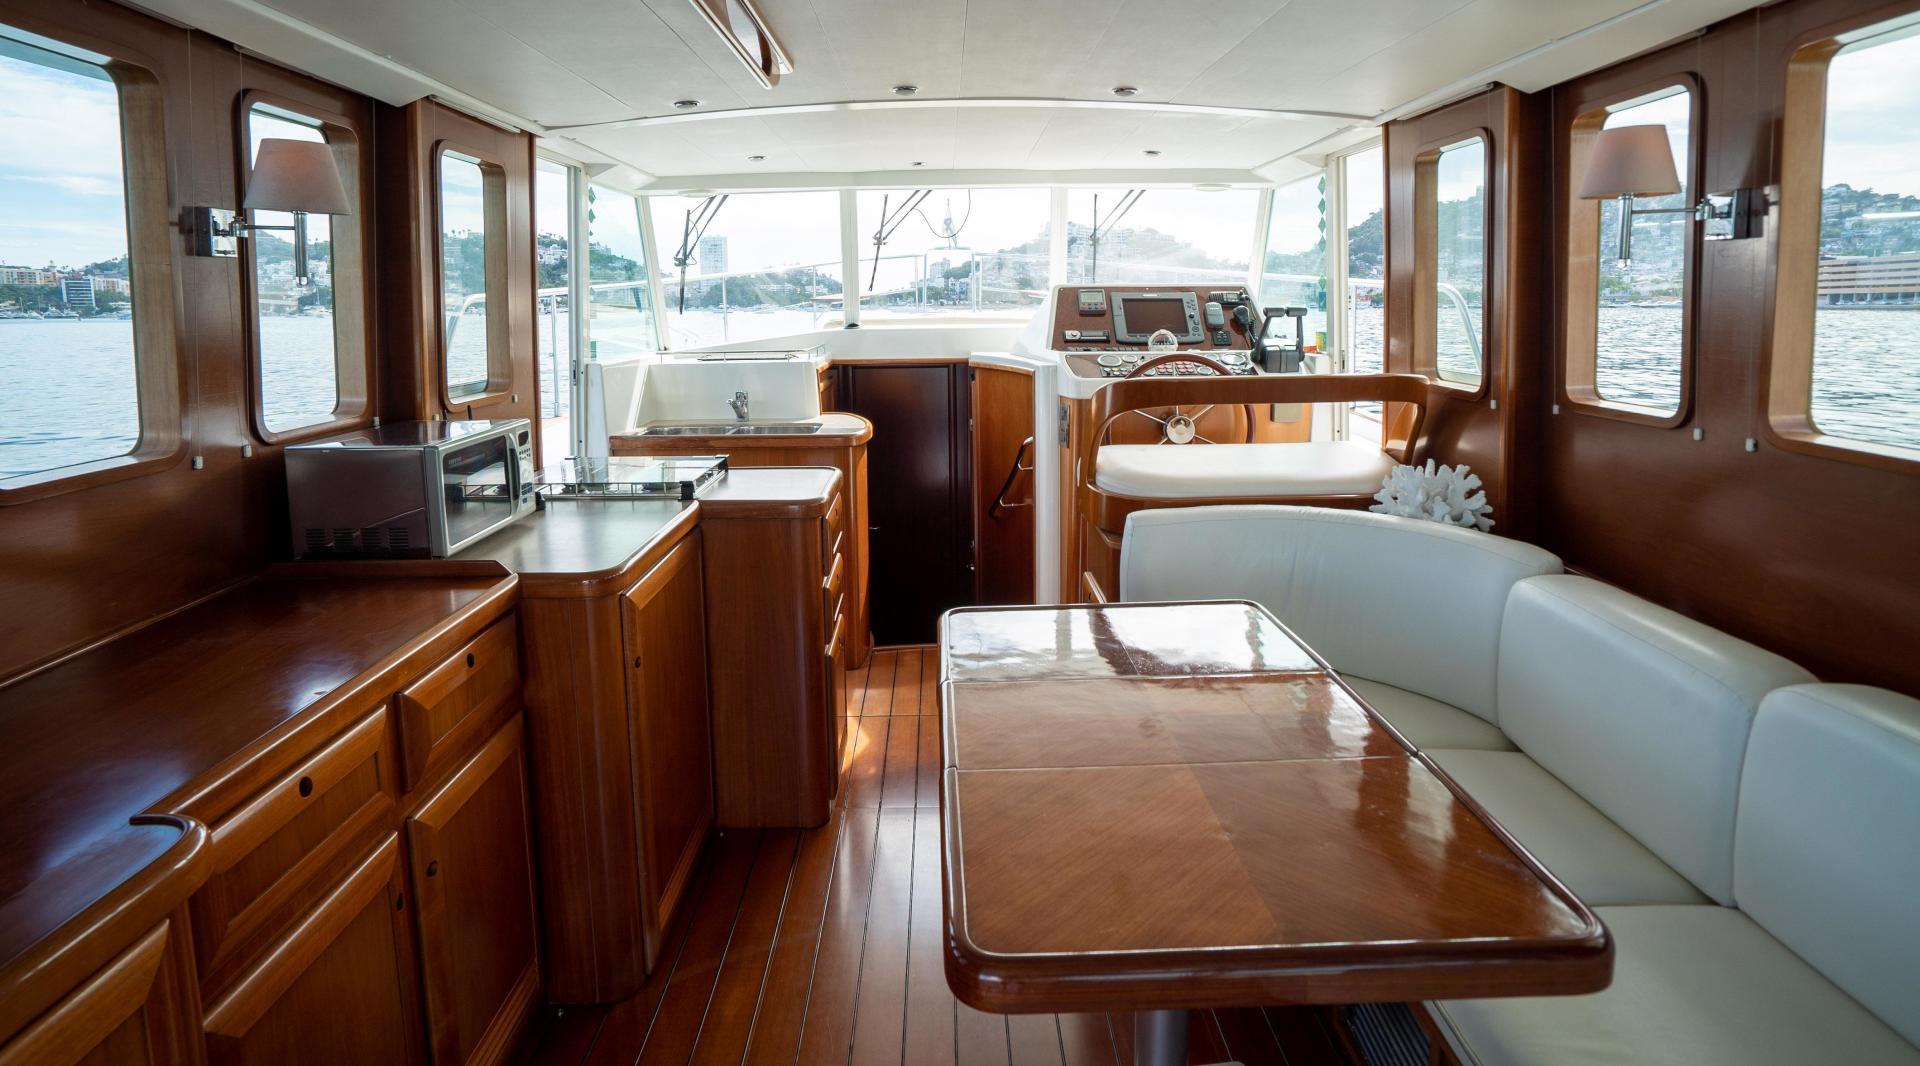 Beneteau-Swift Trawler 2008-Amadeus Acapulco-Mexico-1487069 | Thumbnail